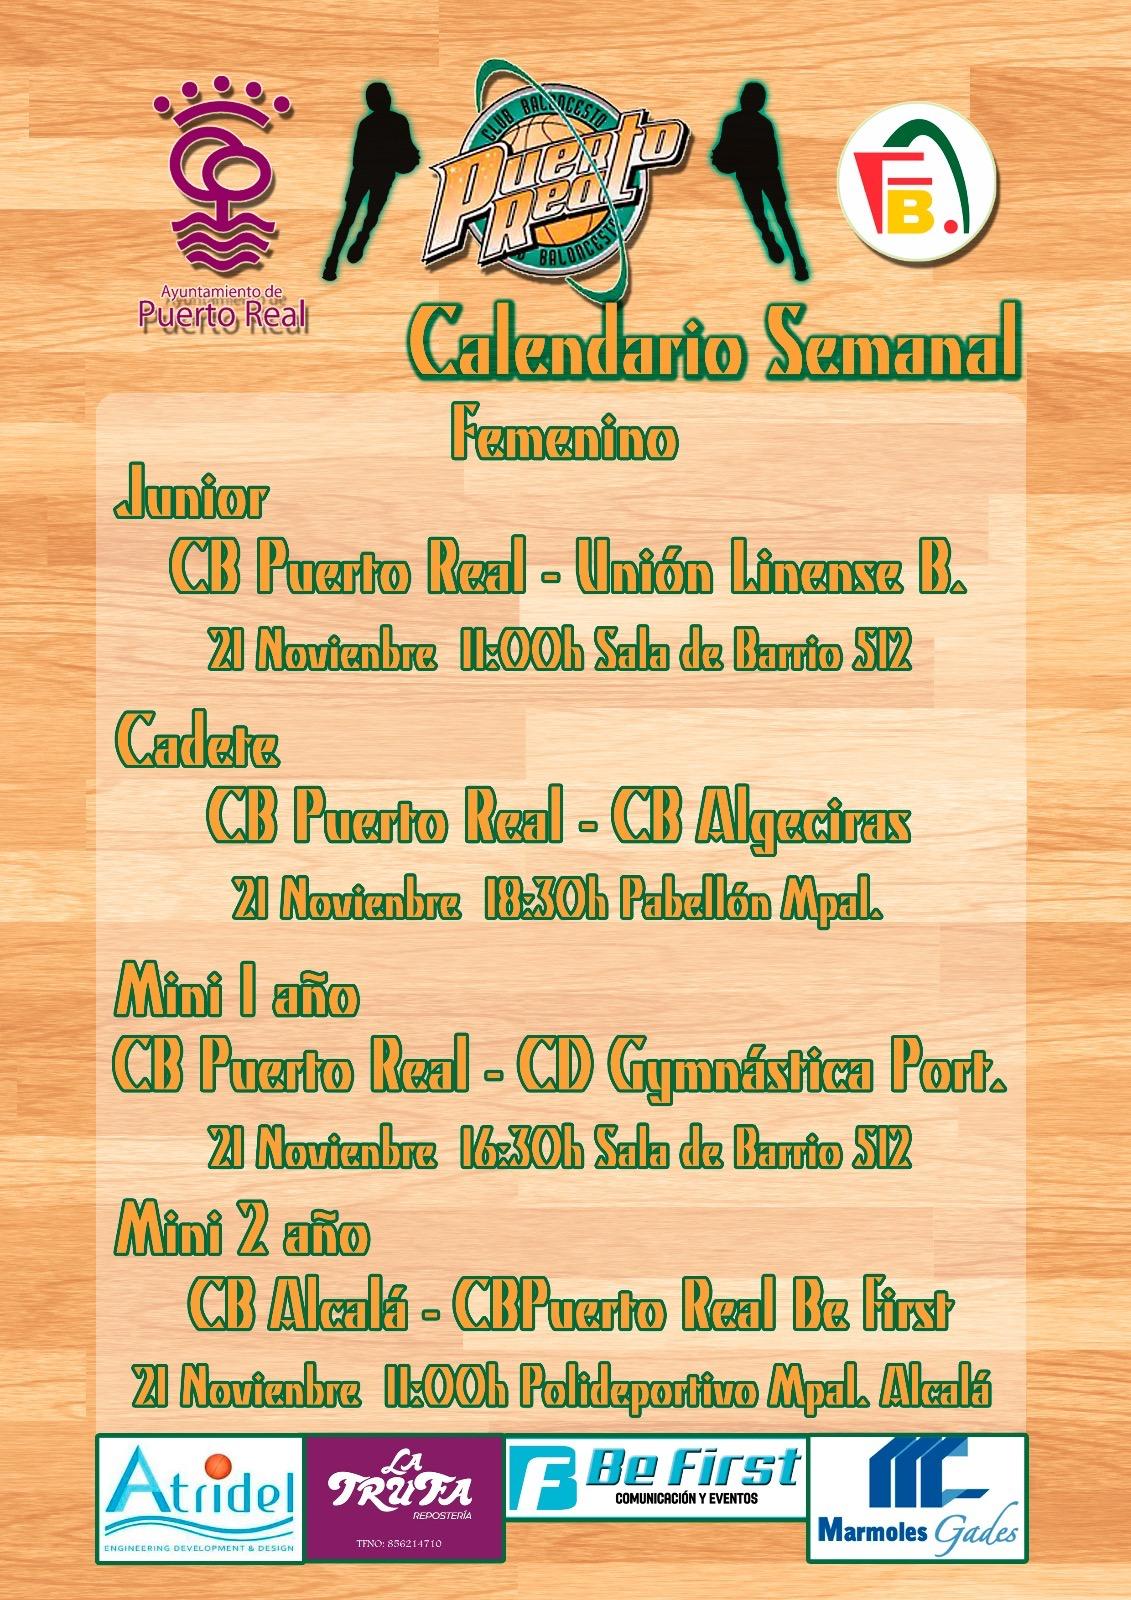 Club baloncesto puerto real horarios de partidos 21 22 for Horario correos puerto real